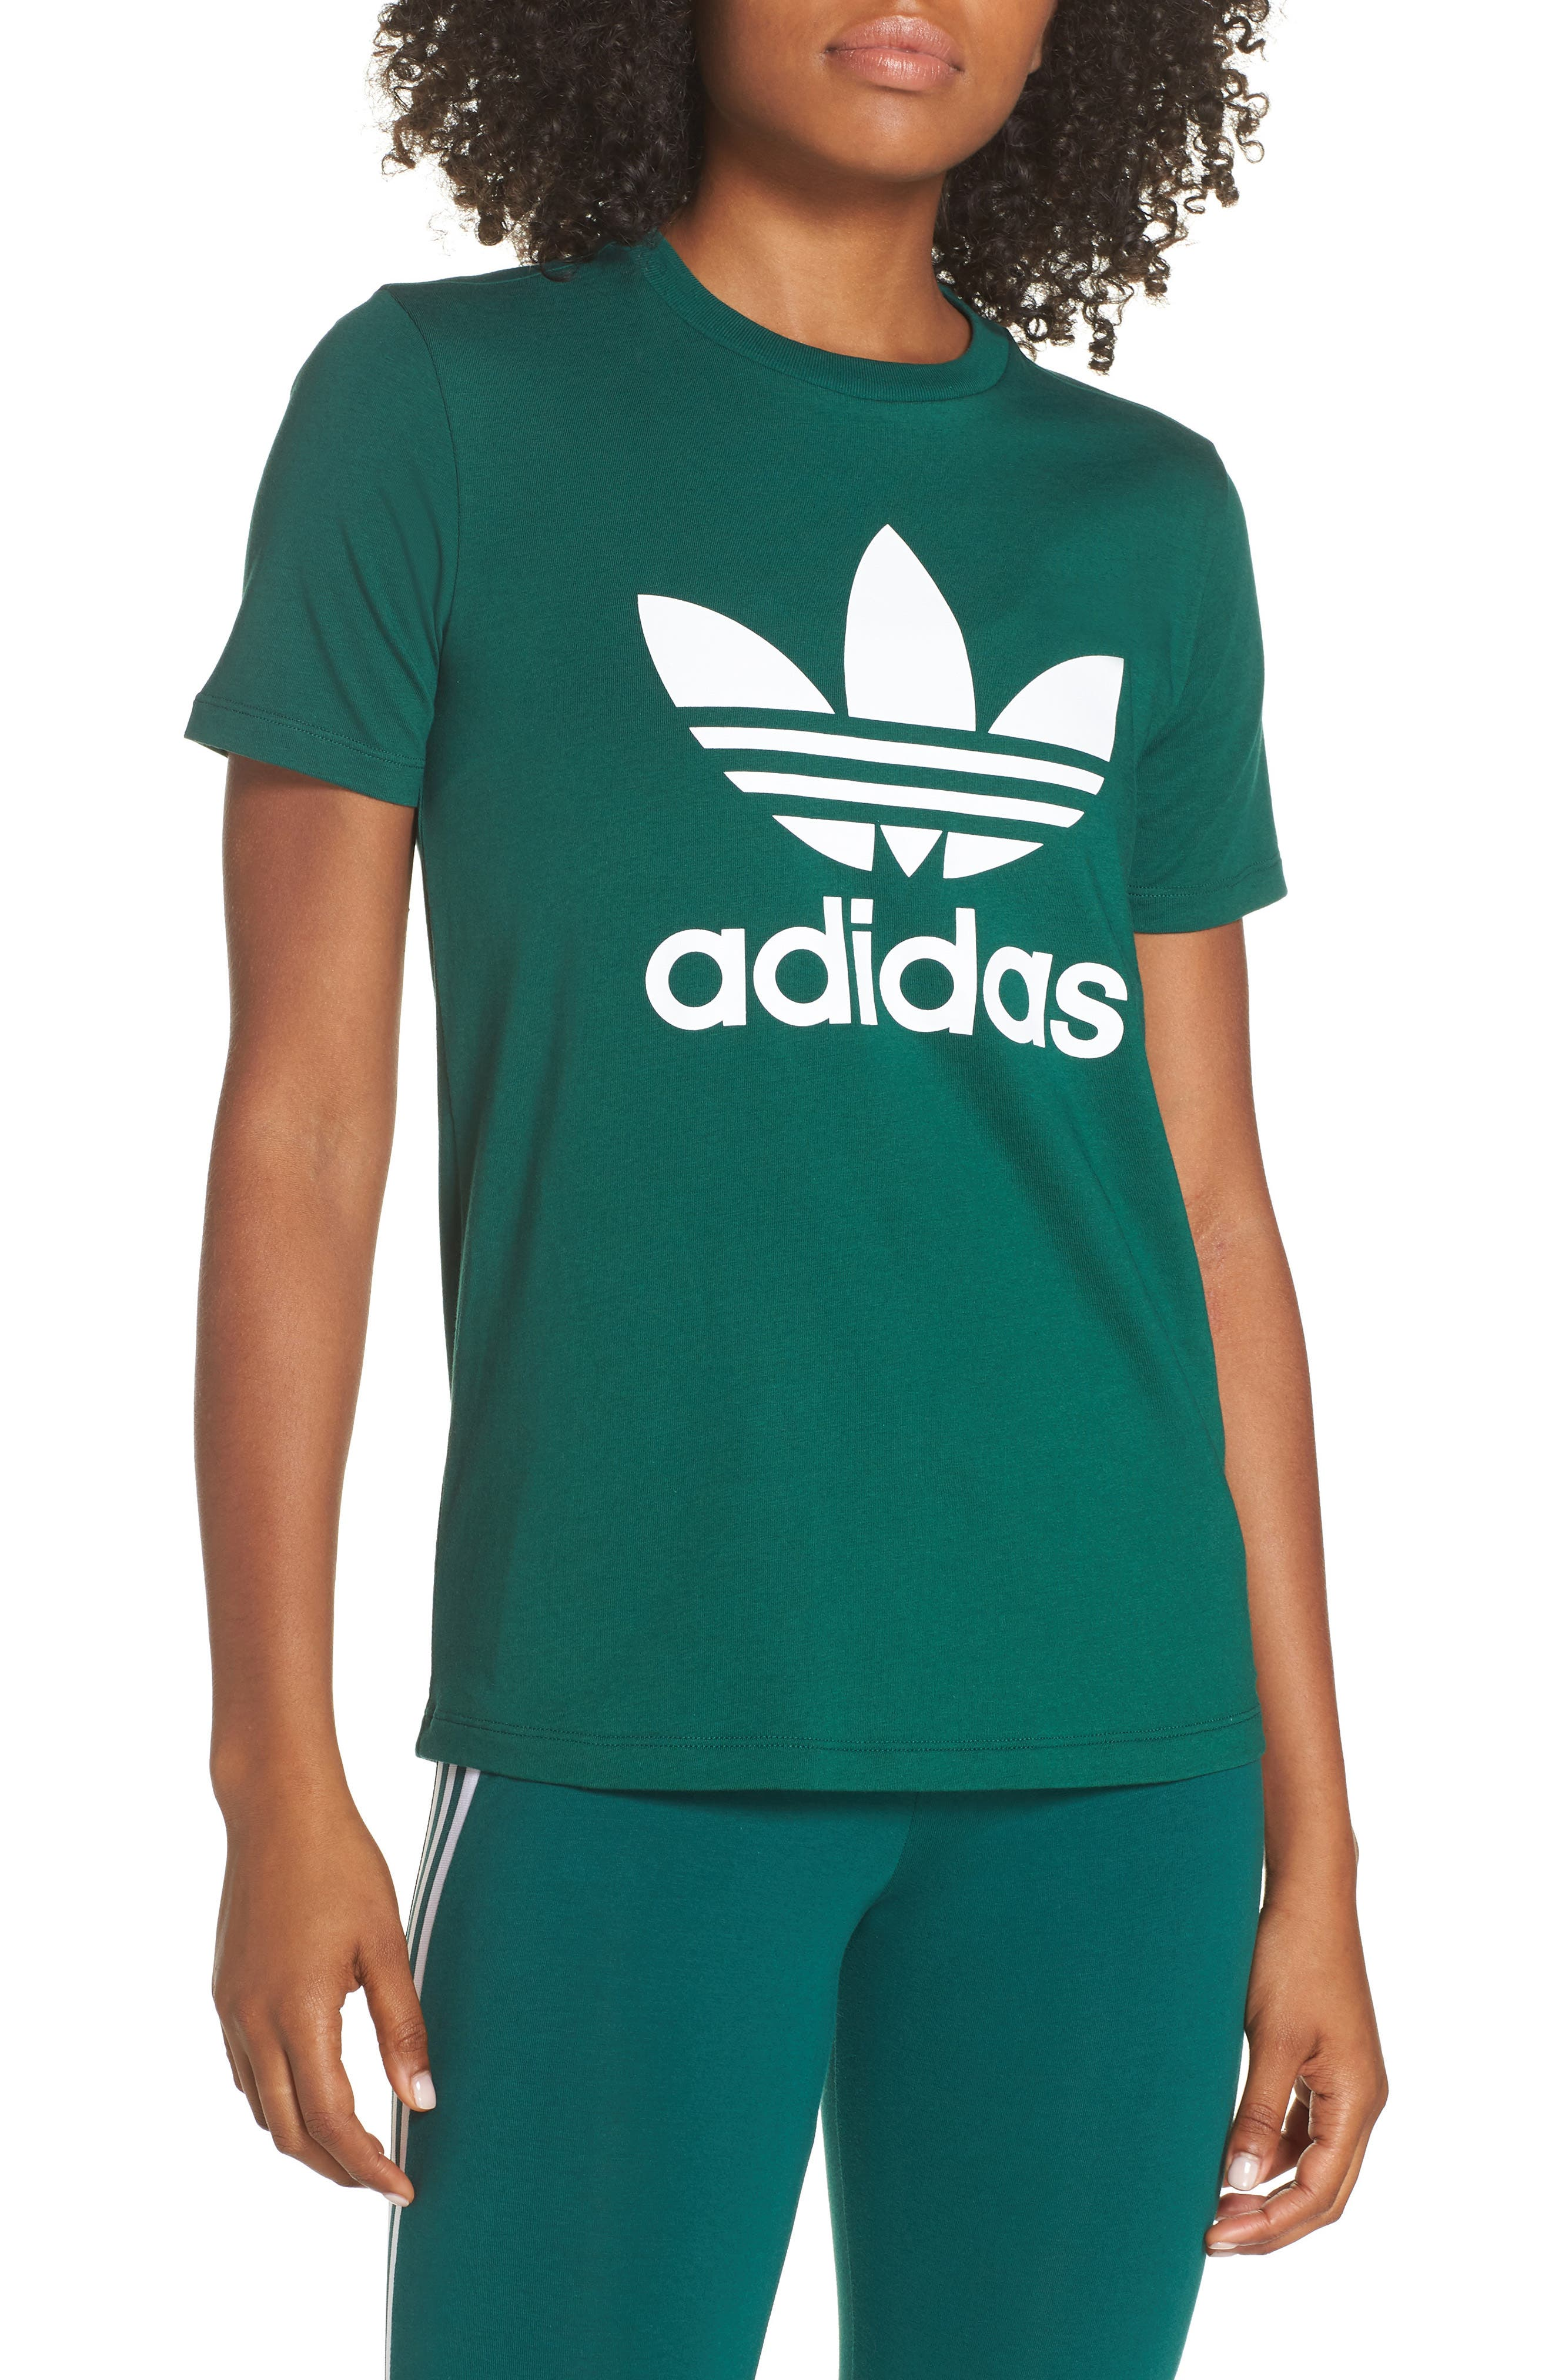 Adidas Trefoil Tee, Green